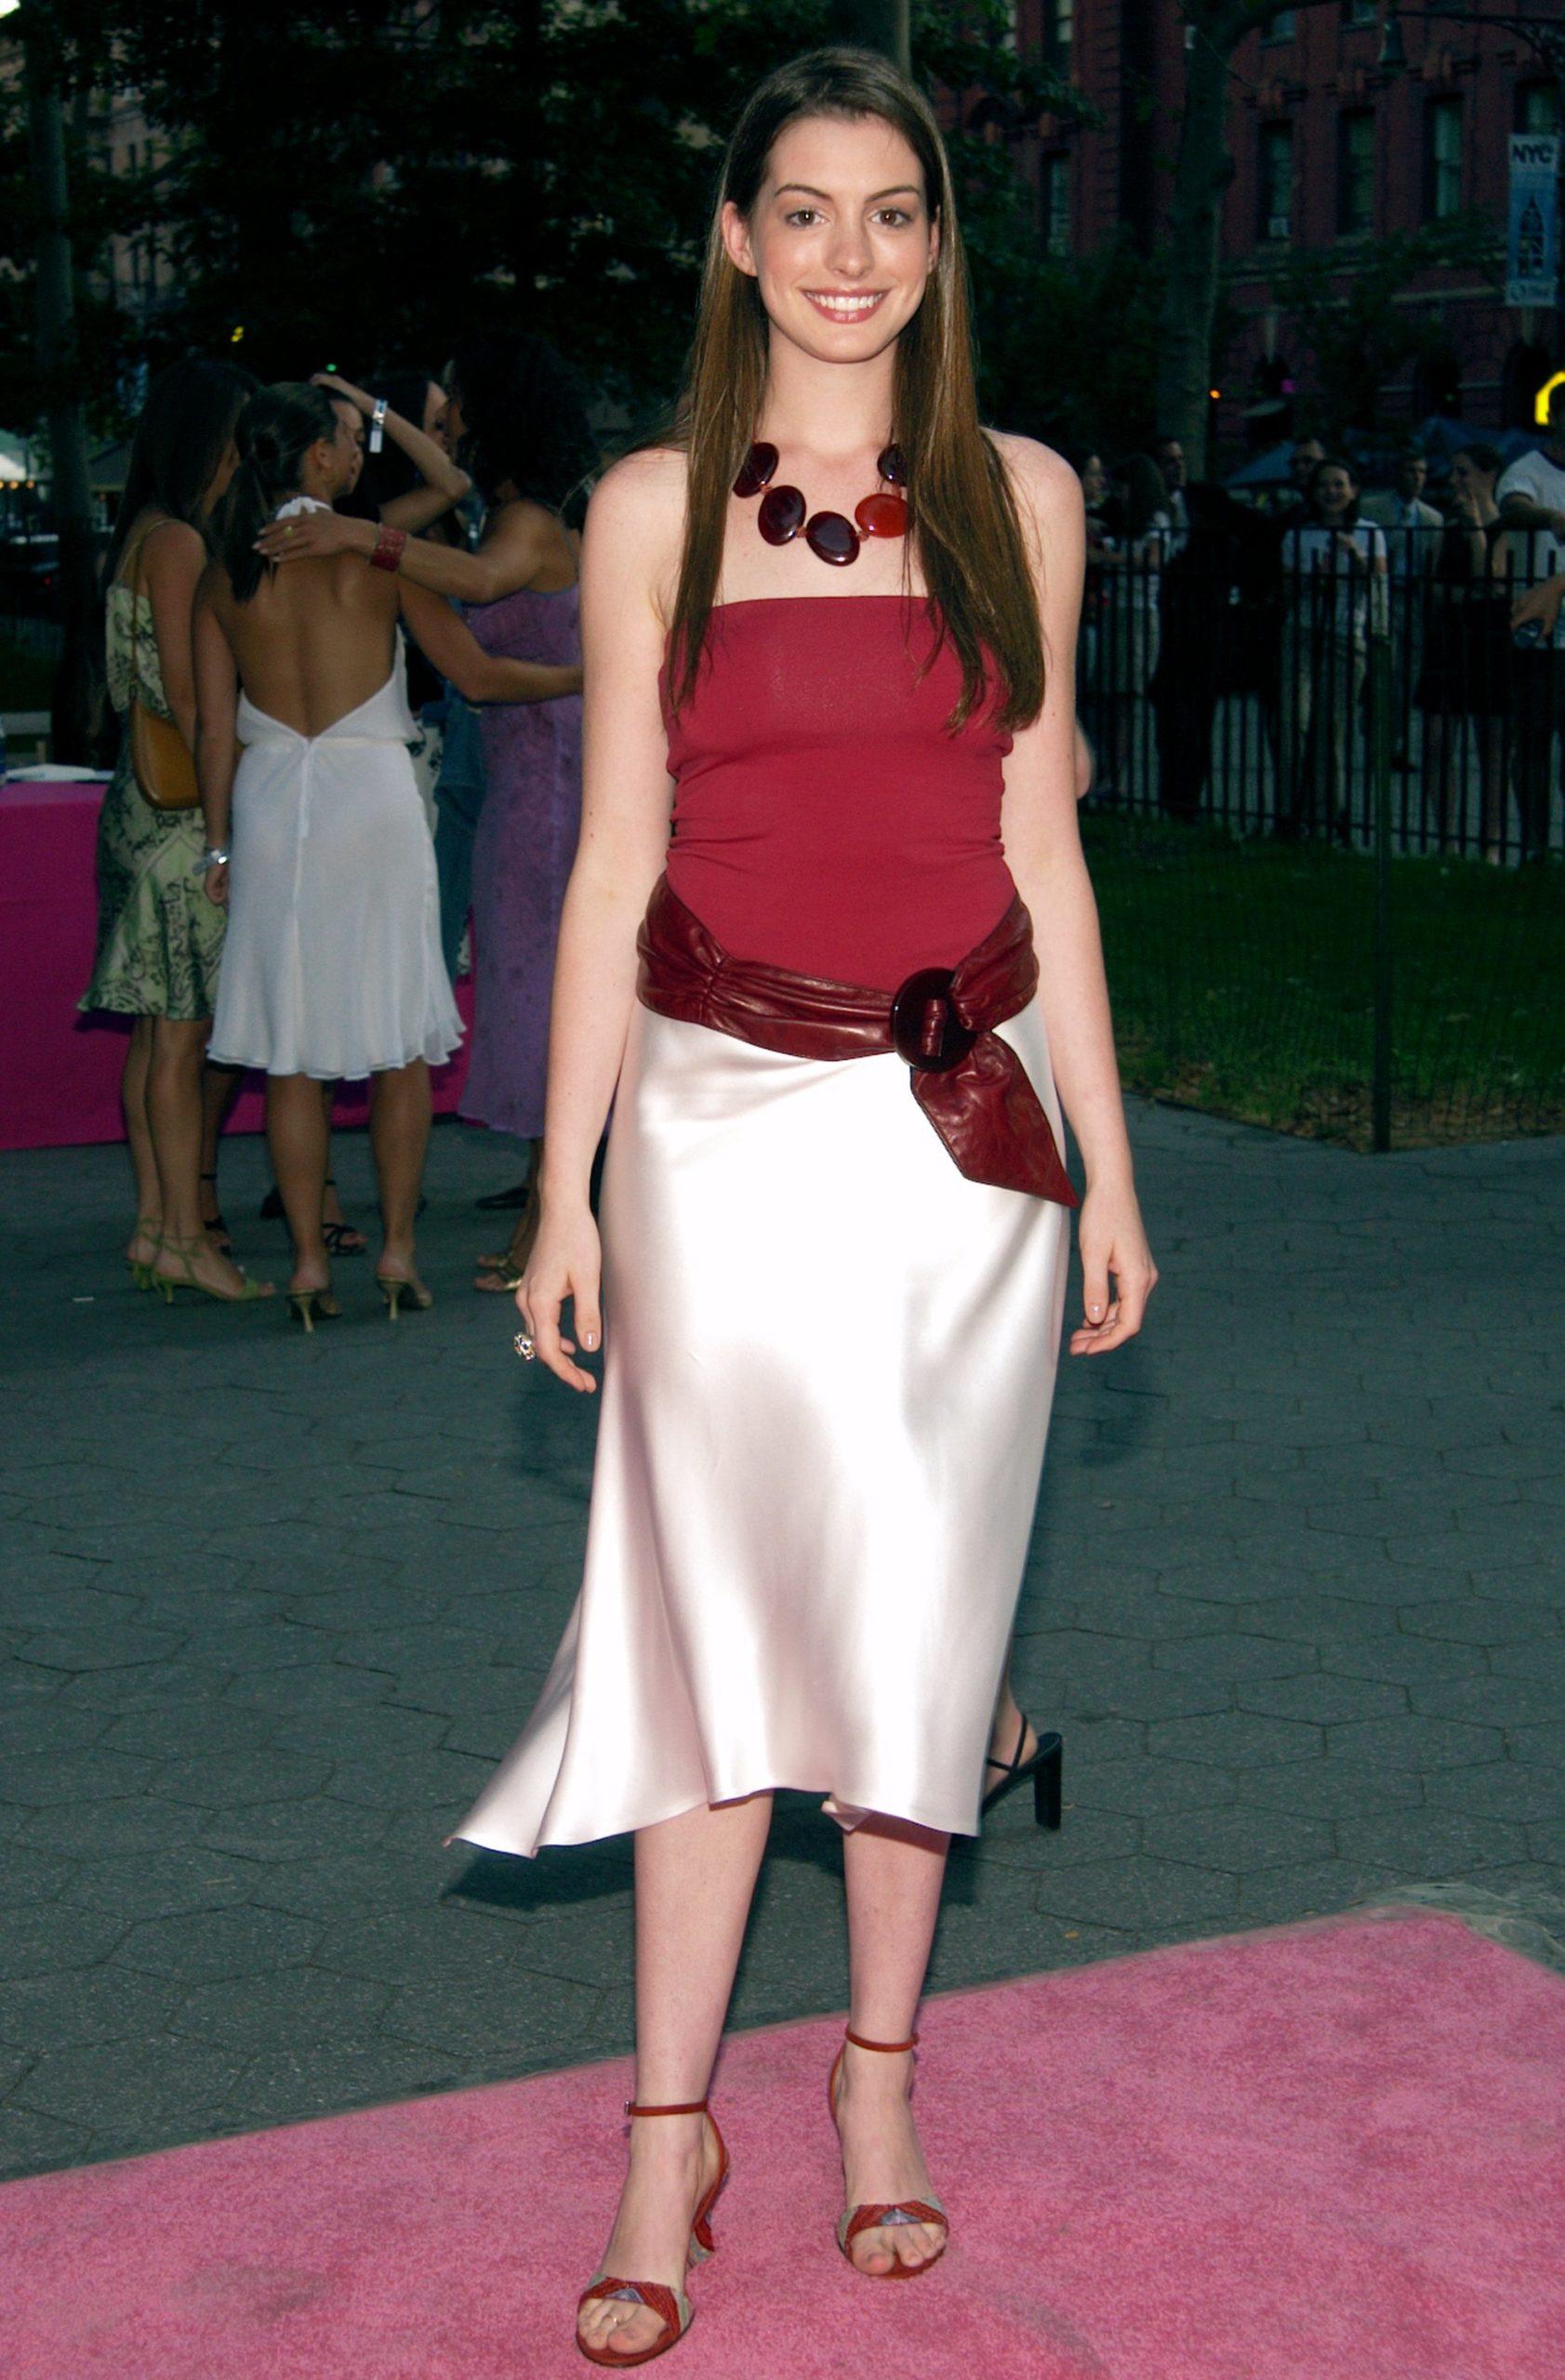 Энн Хэтэуэй (2002). Фото: Lawrence Lucier/Getty Images